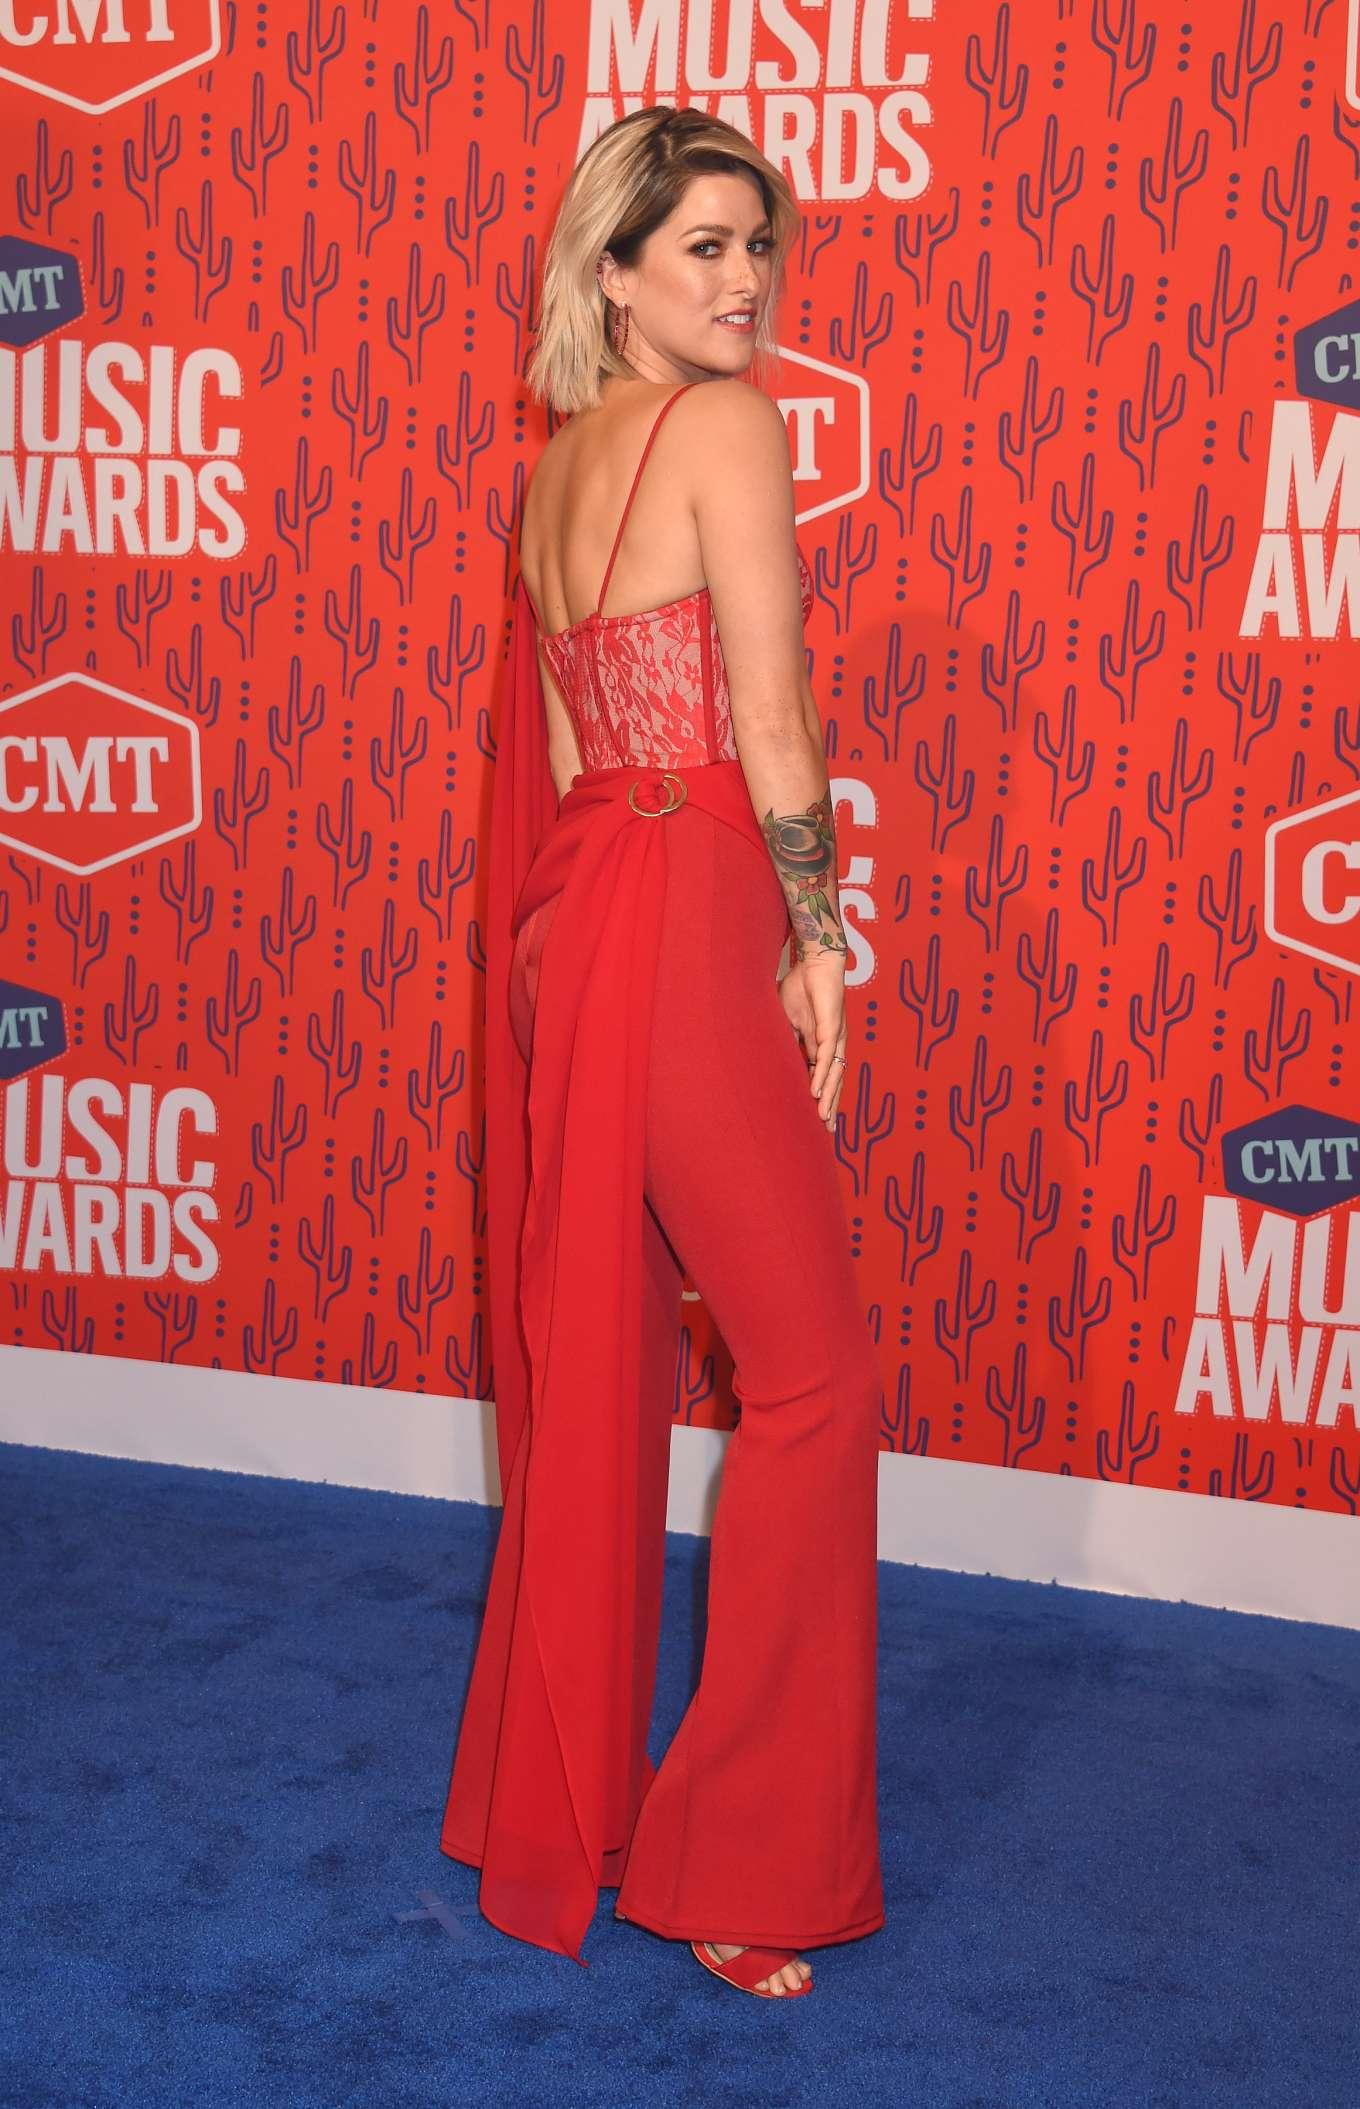 Cassadee Pope 2019 : Cassadee Pope: 2019 CMT Music Awards-20